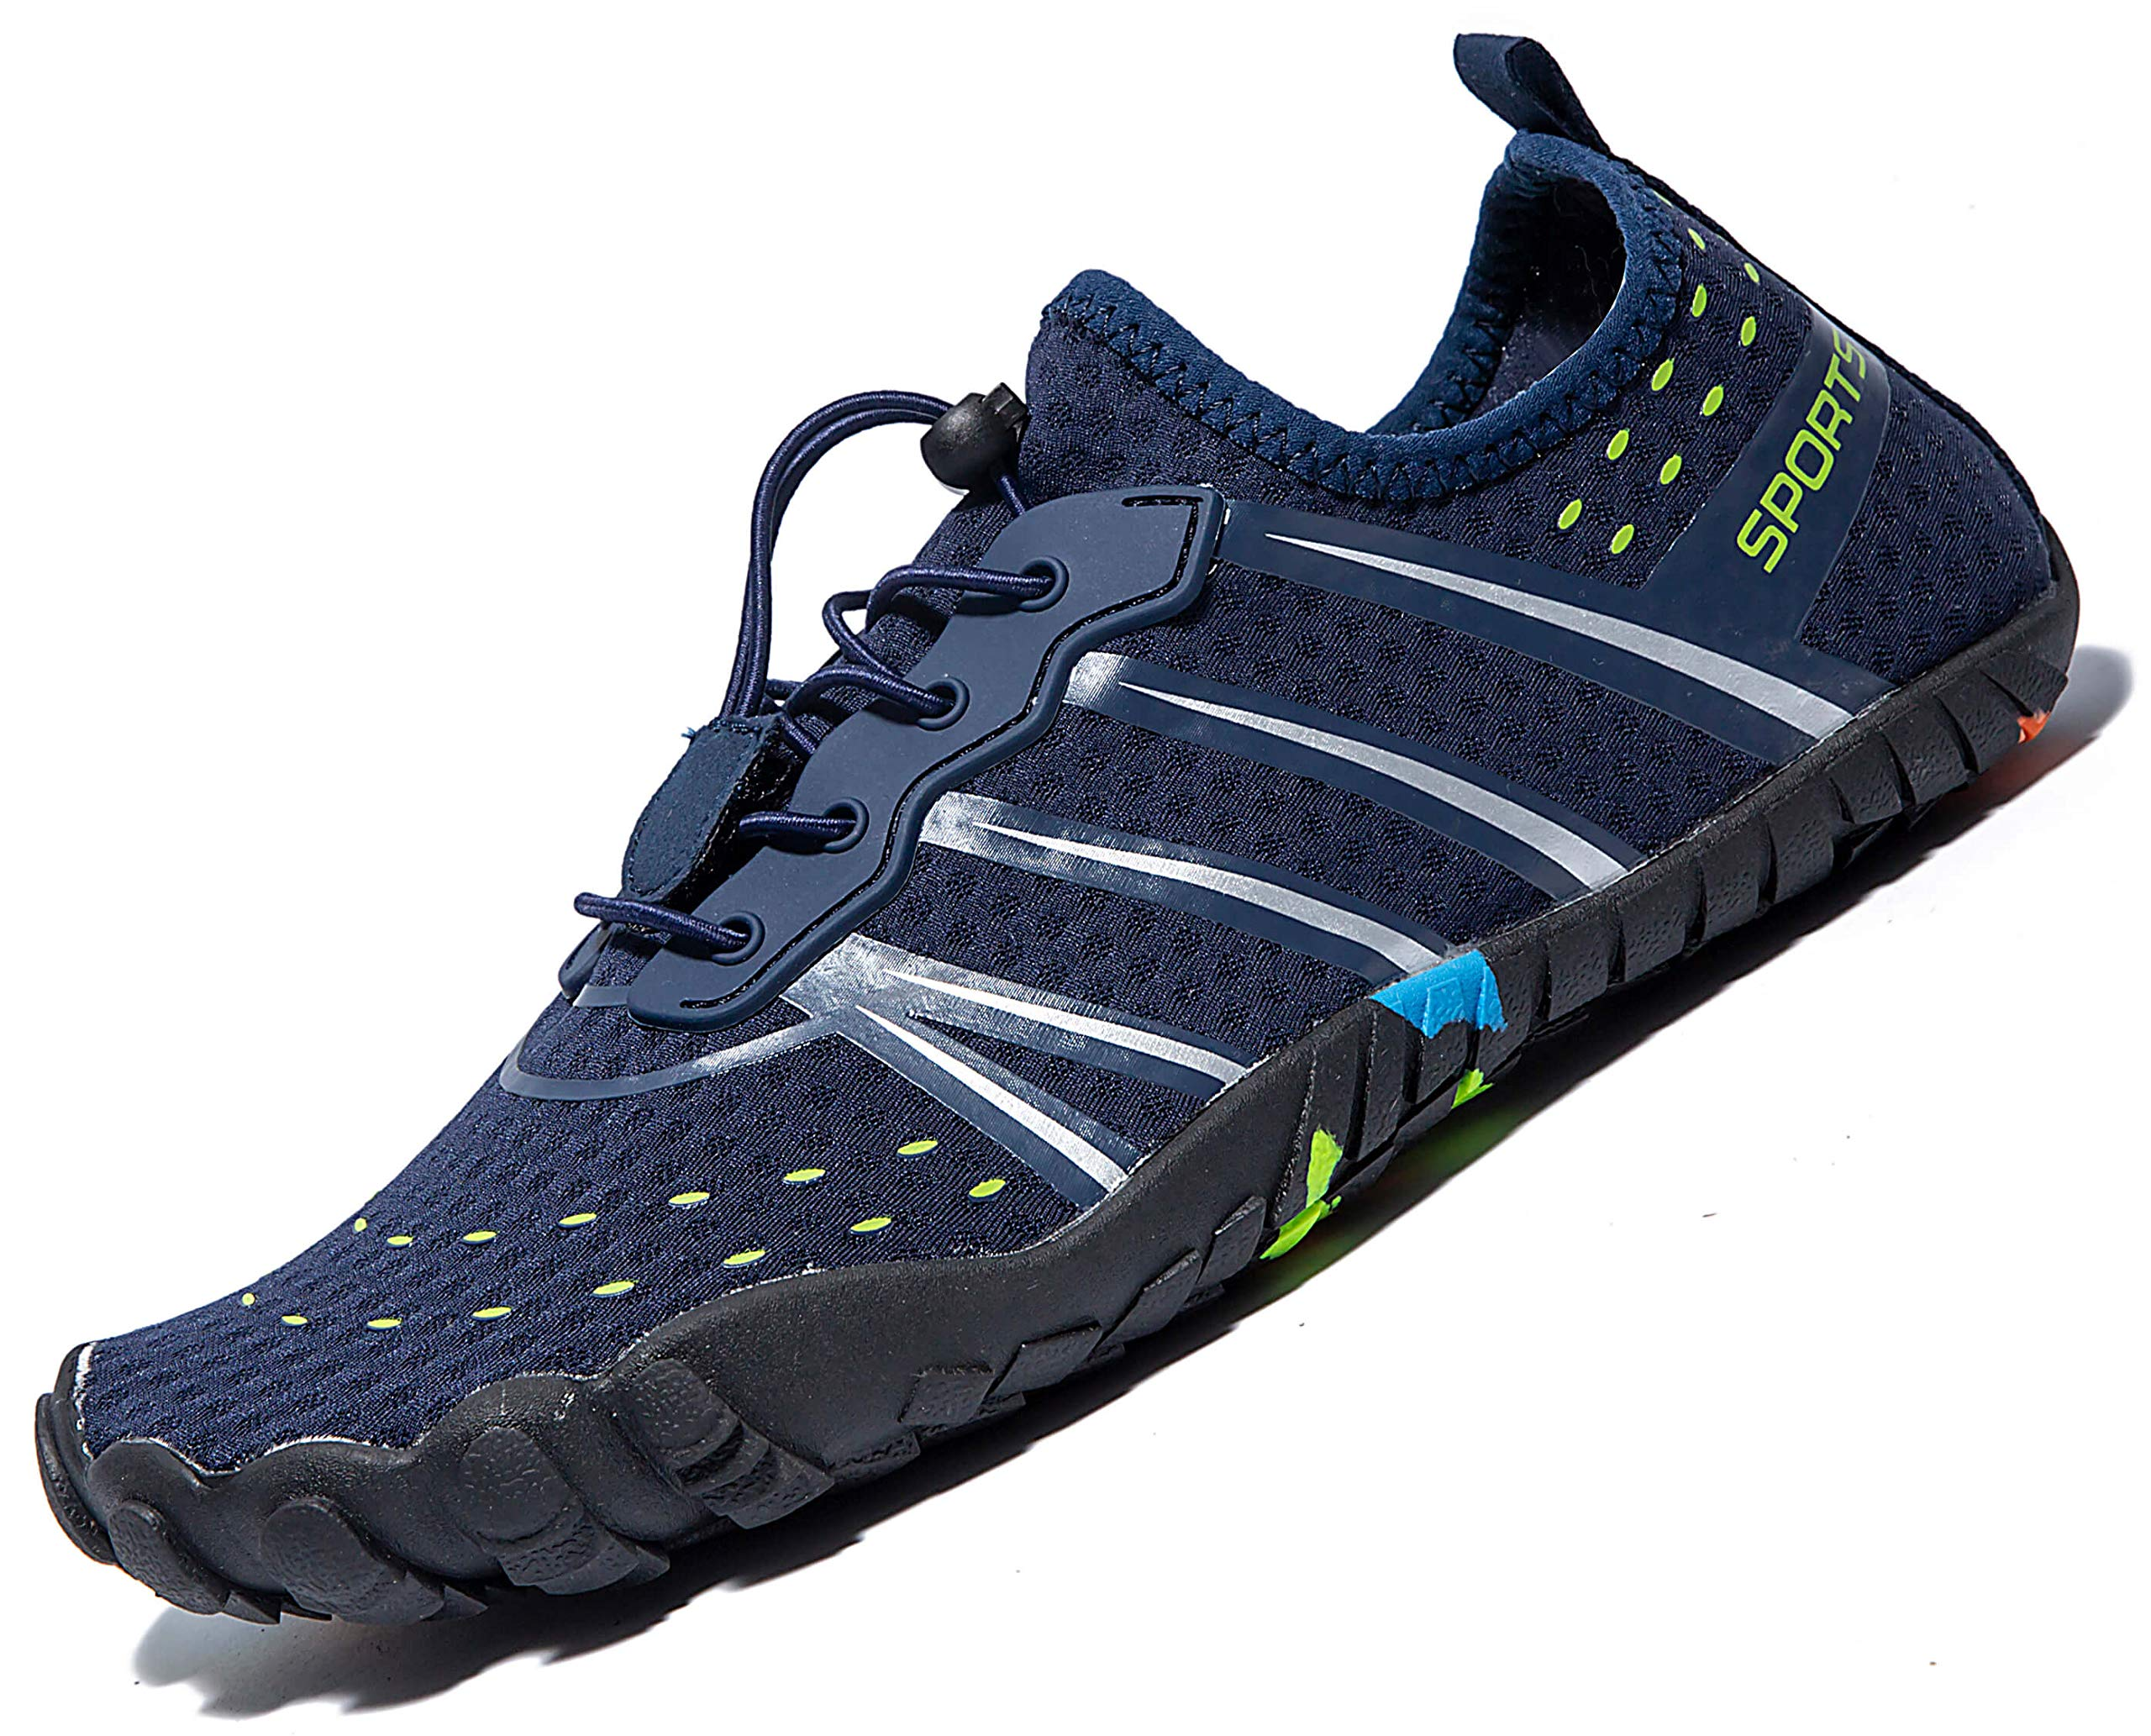 LINGTOM Mens Womens Aqua Water Shoes Quick Dry Barefoot Sports Exercise for Walking Swimming Diving Beach Surf Pool Yoga,Dark Blue 12.5 M US Women / 11 M US Men by LINGTOM (Image #2)